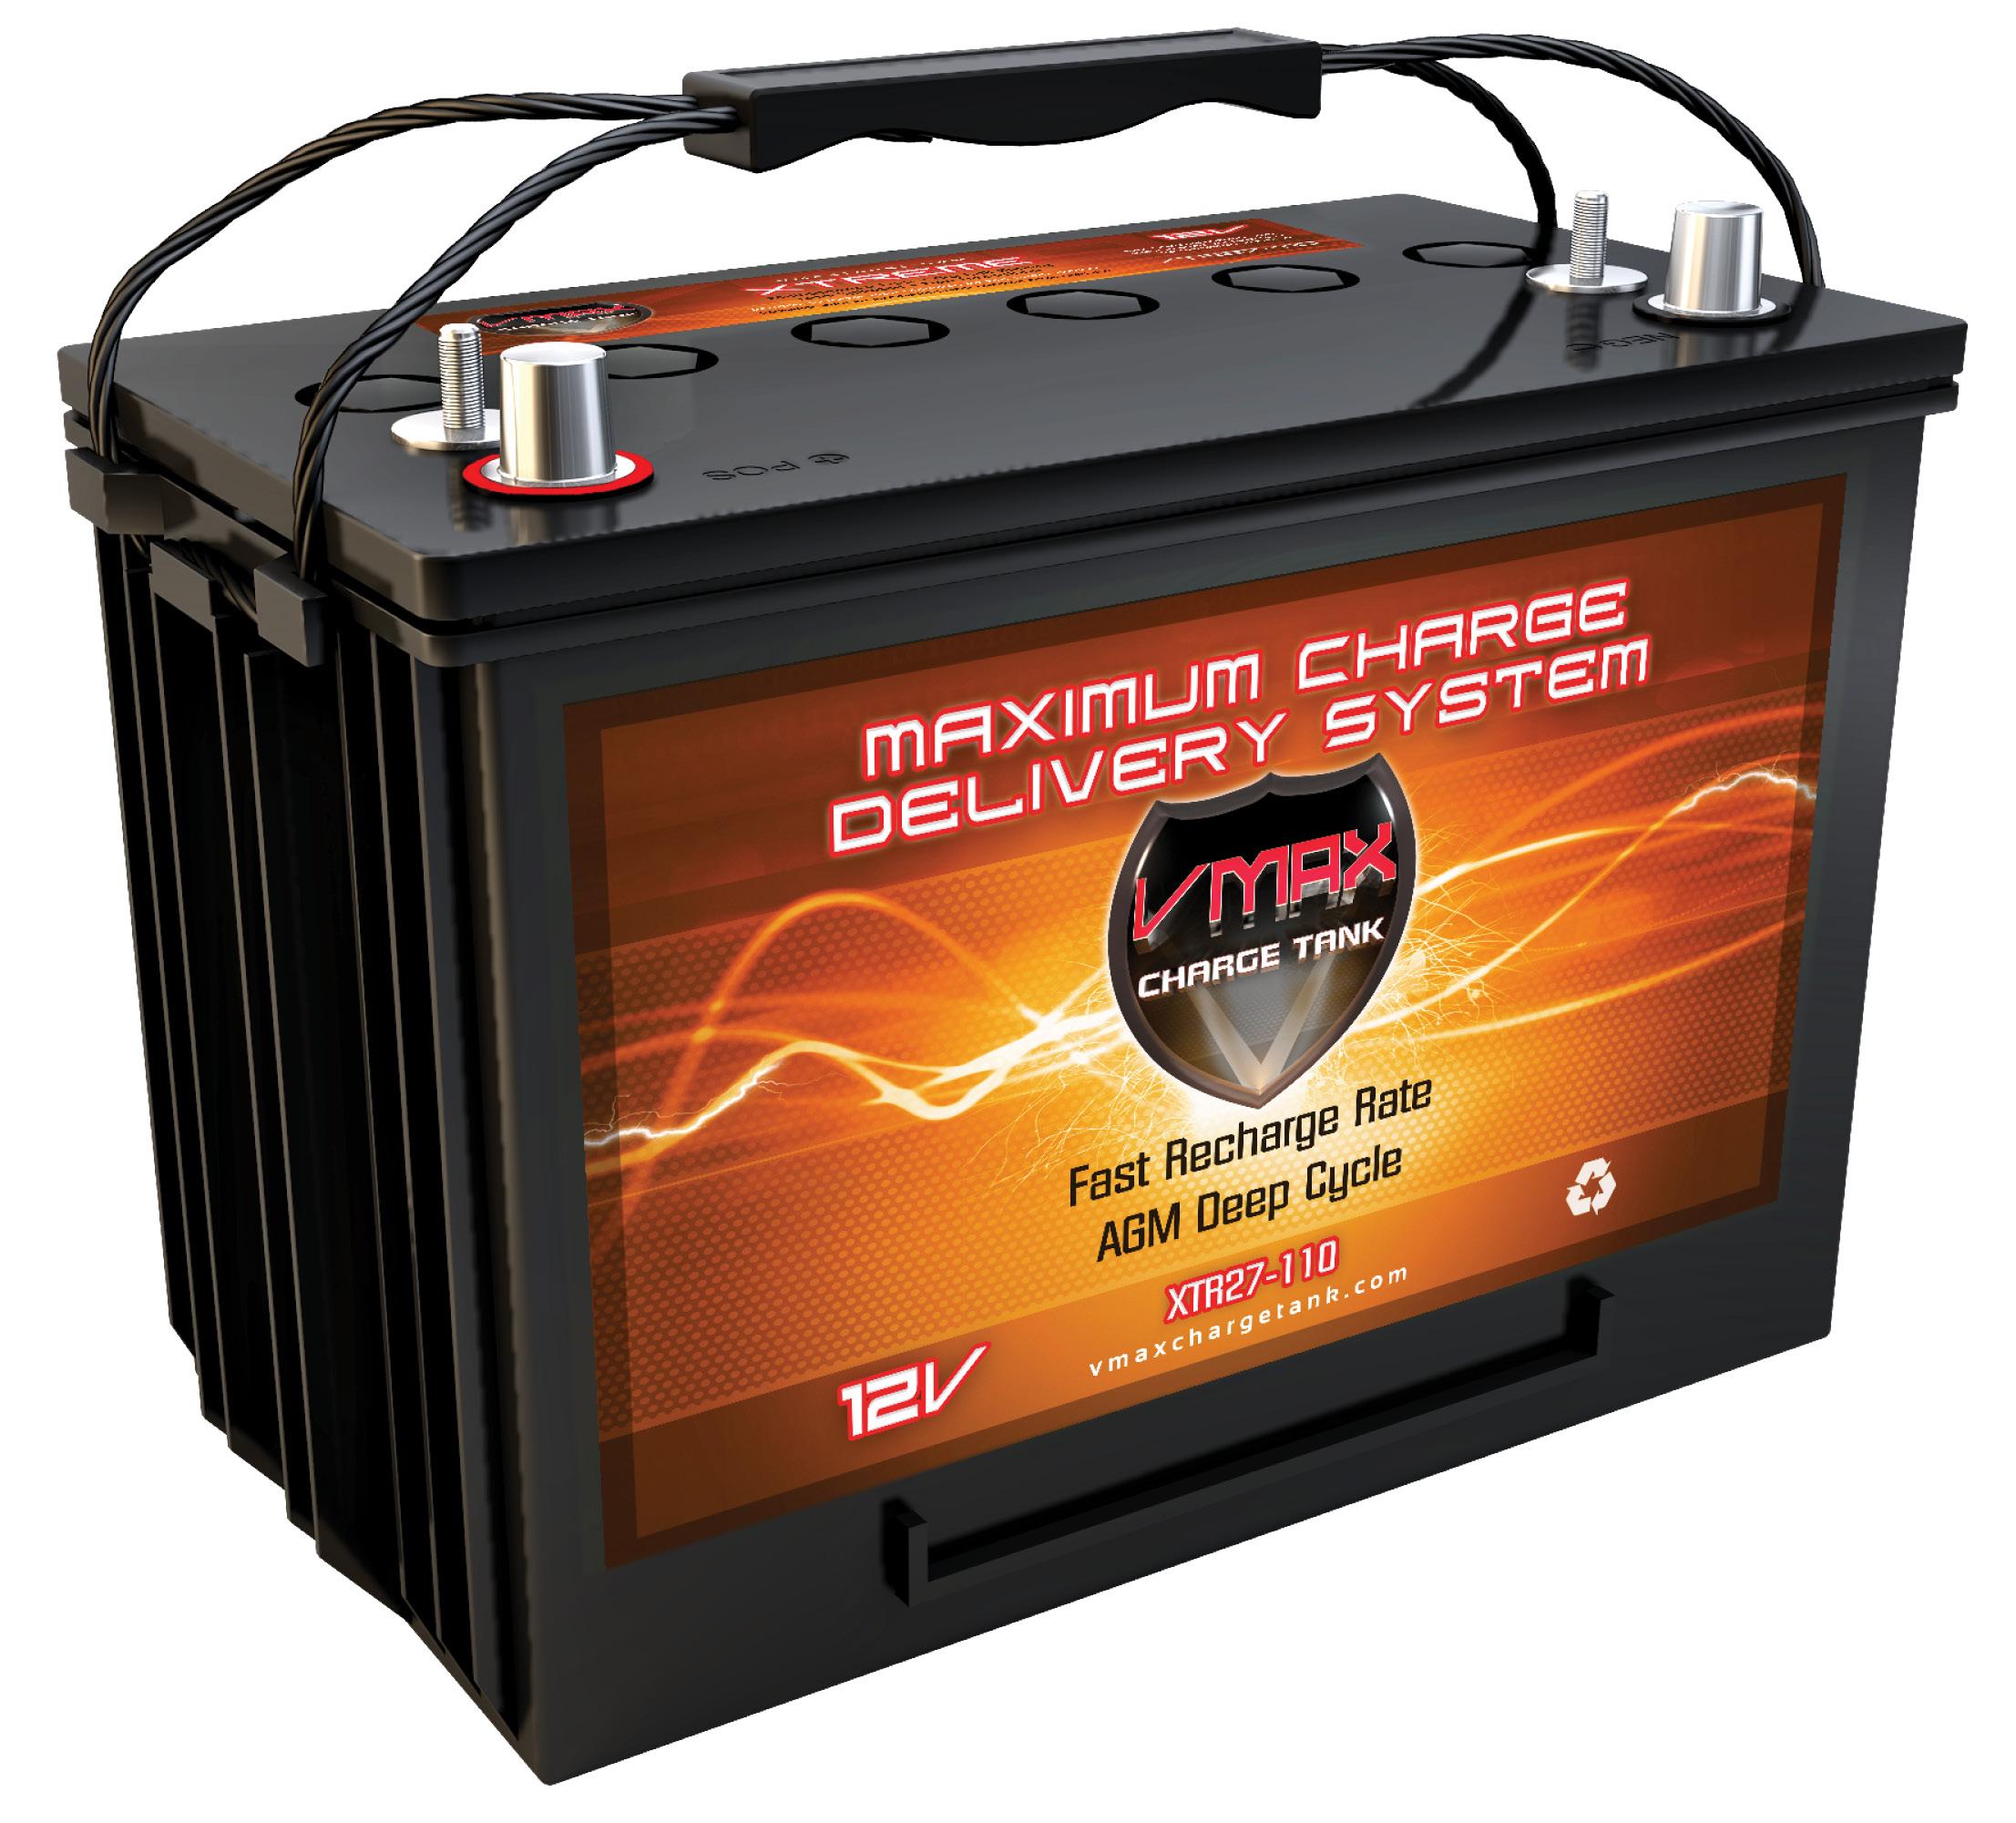 ac delco car battery walmart  VMAX XTR27-110 Heavy Duty Battery replaces AC Delco DC27 12V AGM ...